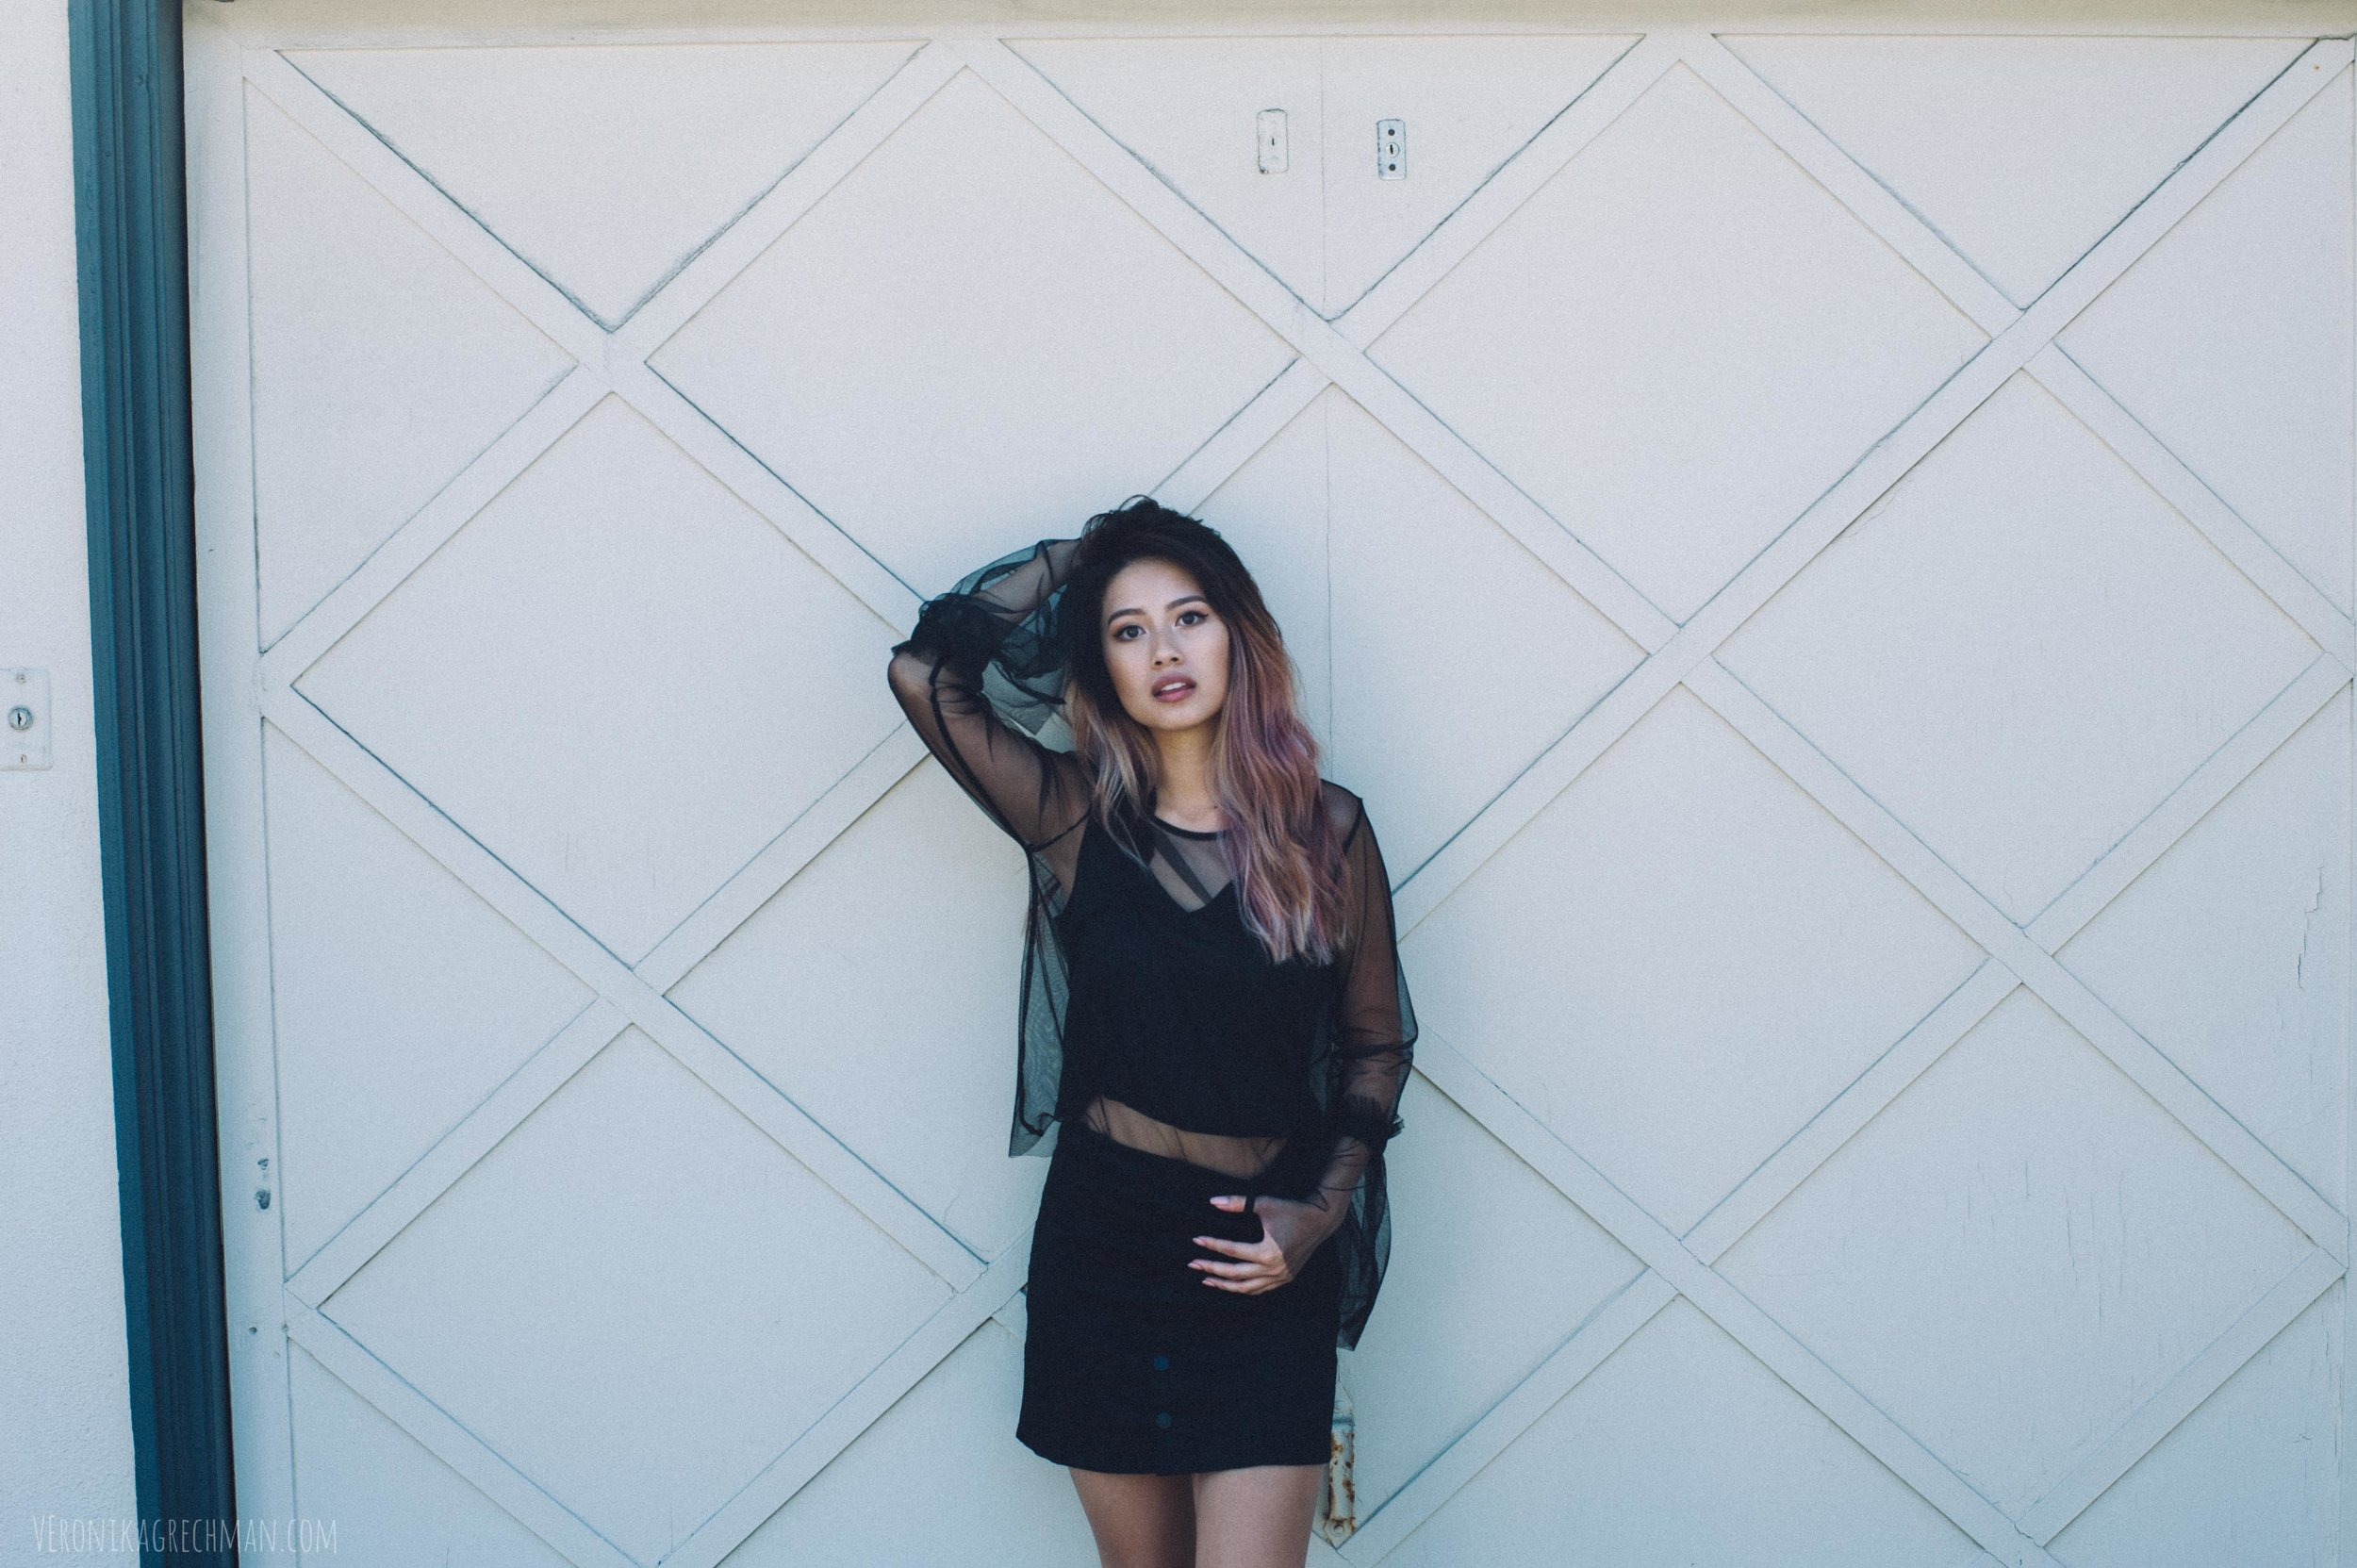 Girl portrait photoshoot inspiration in California